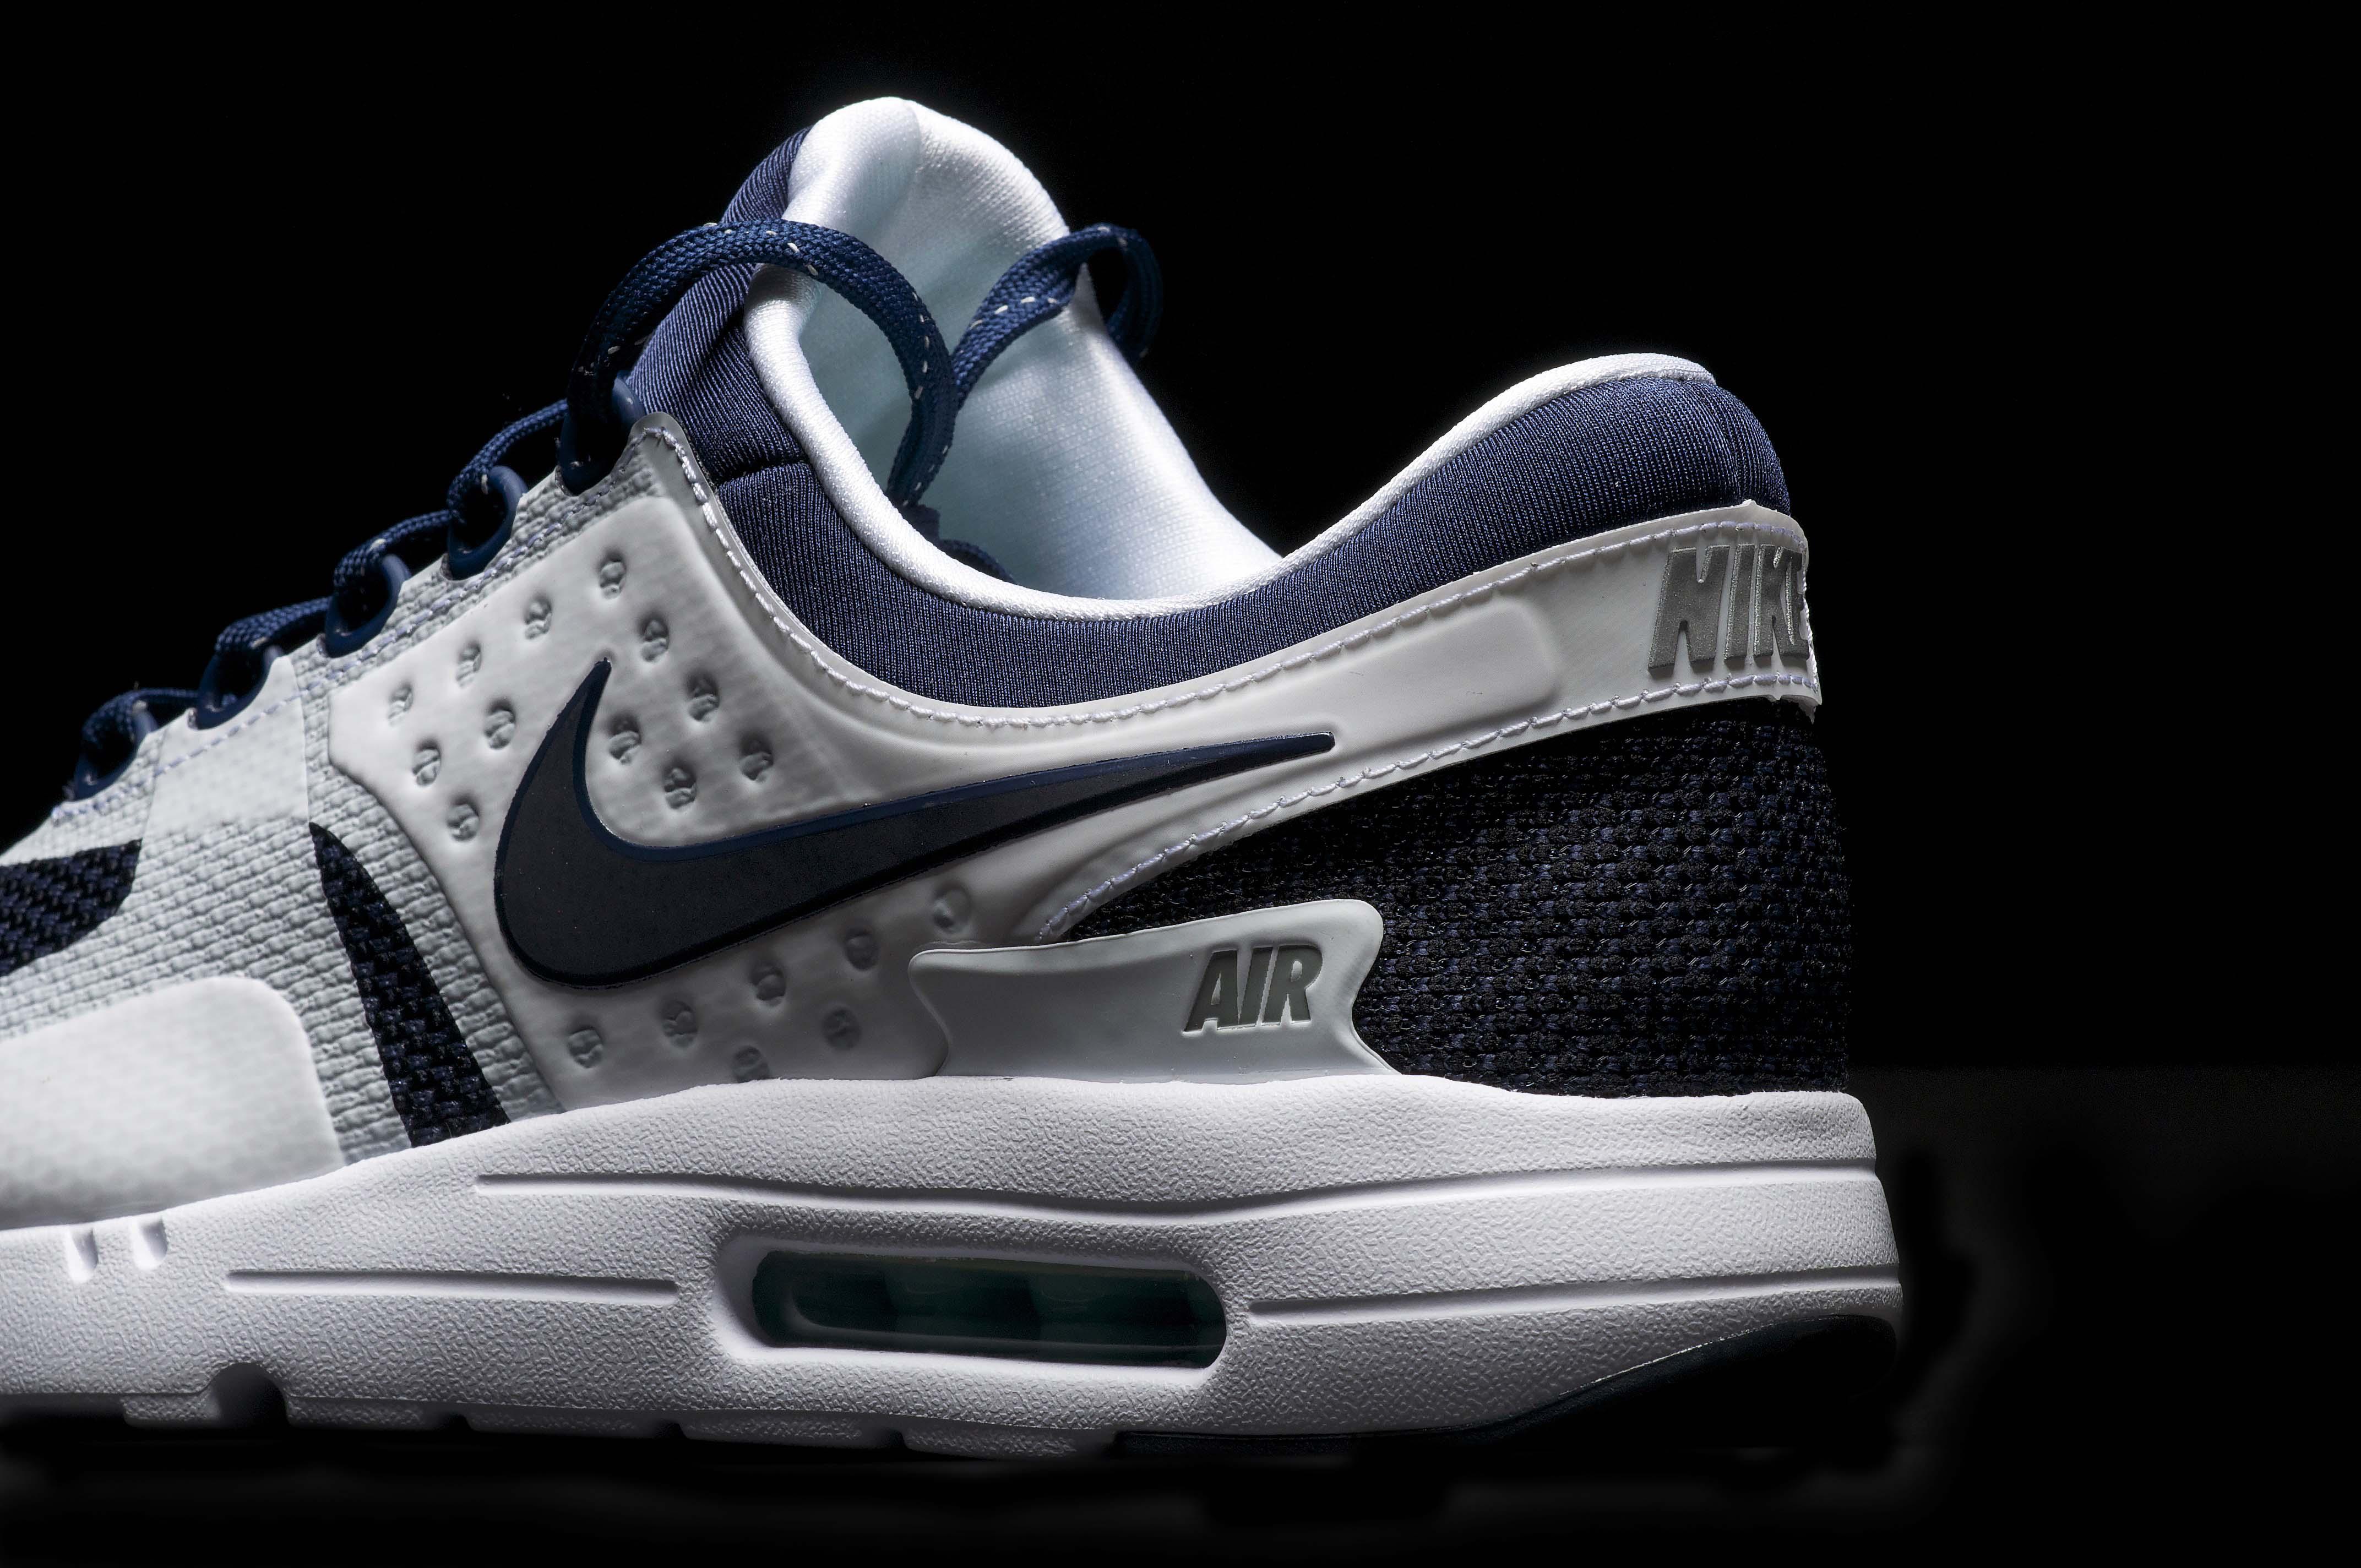 nike air max commijnd lederen sneakers